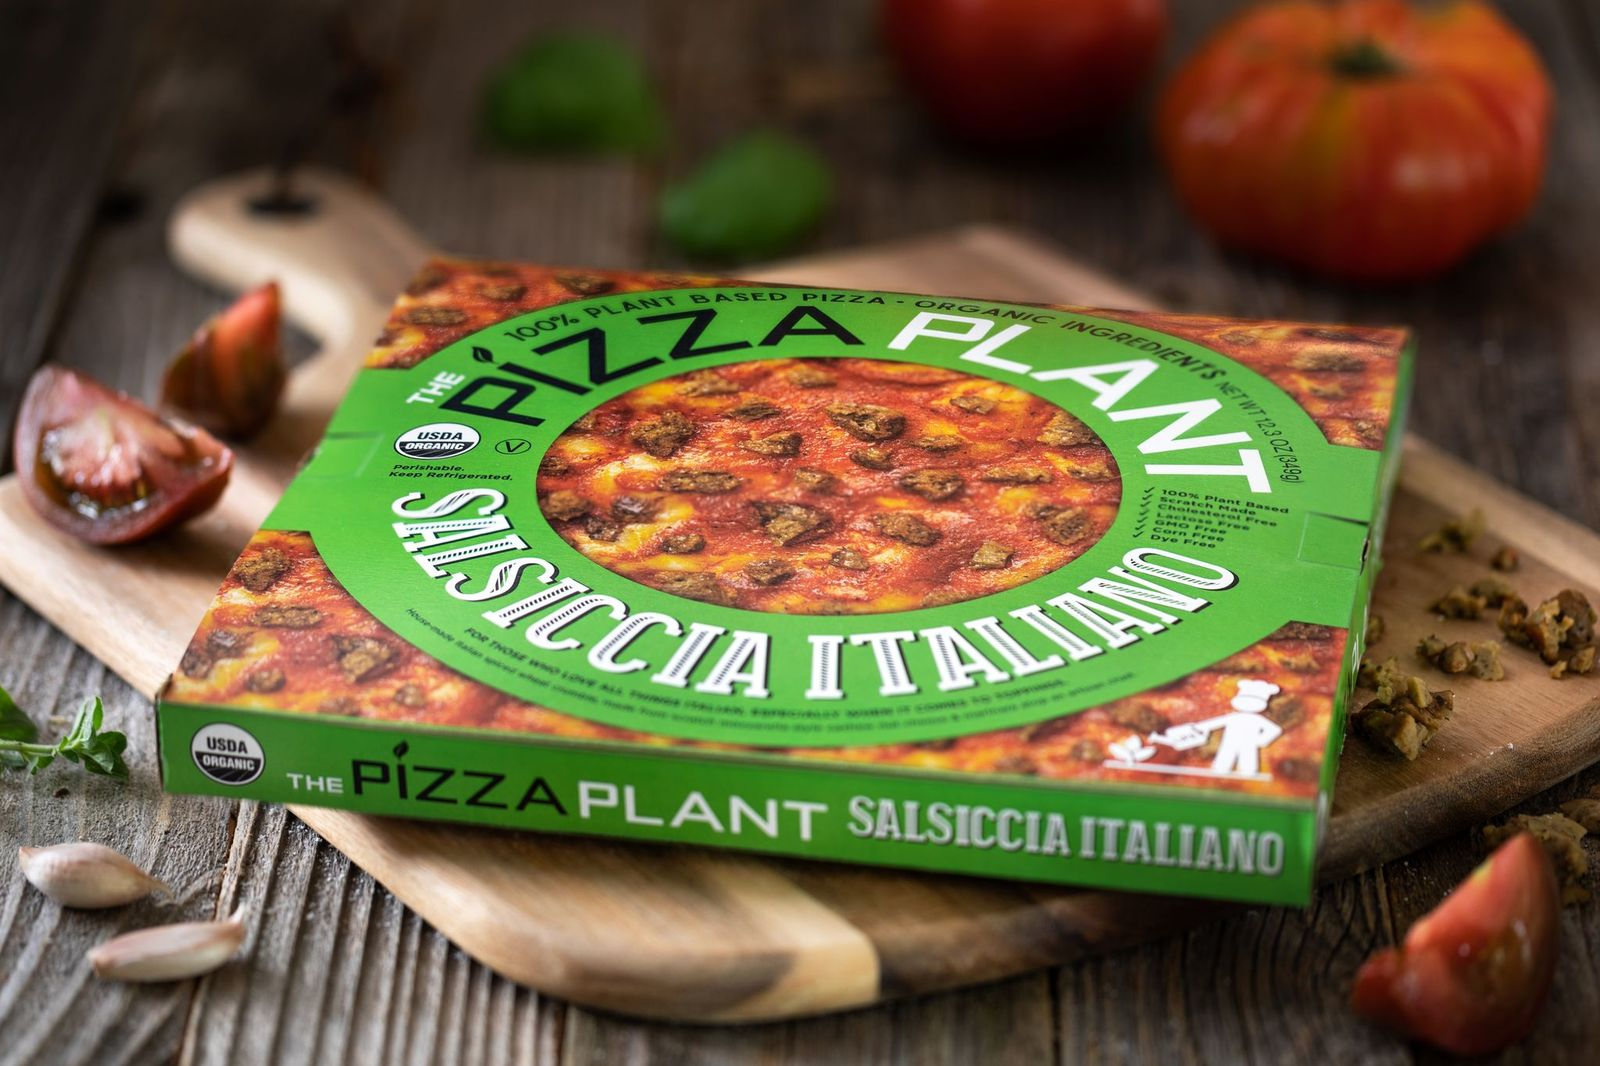 Saliccia Italiano Plant-Based Pizza